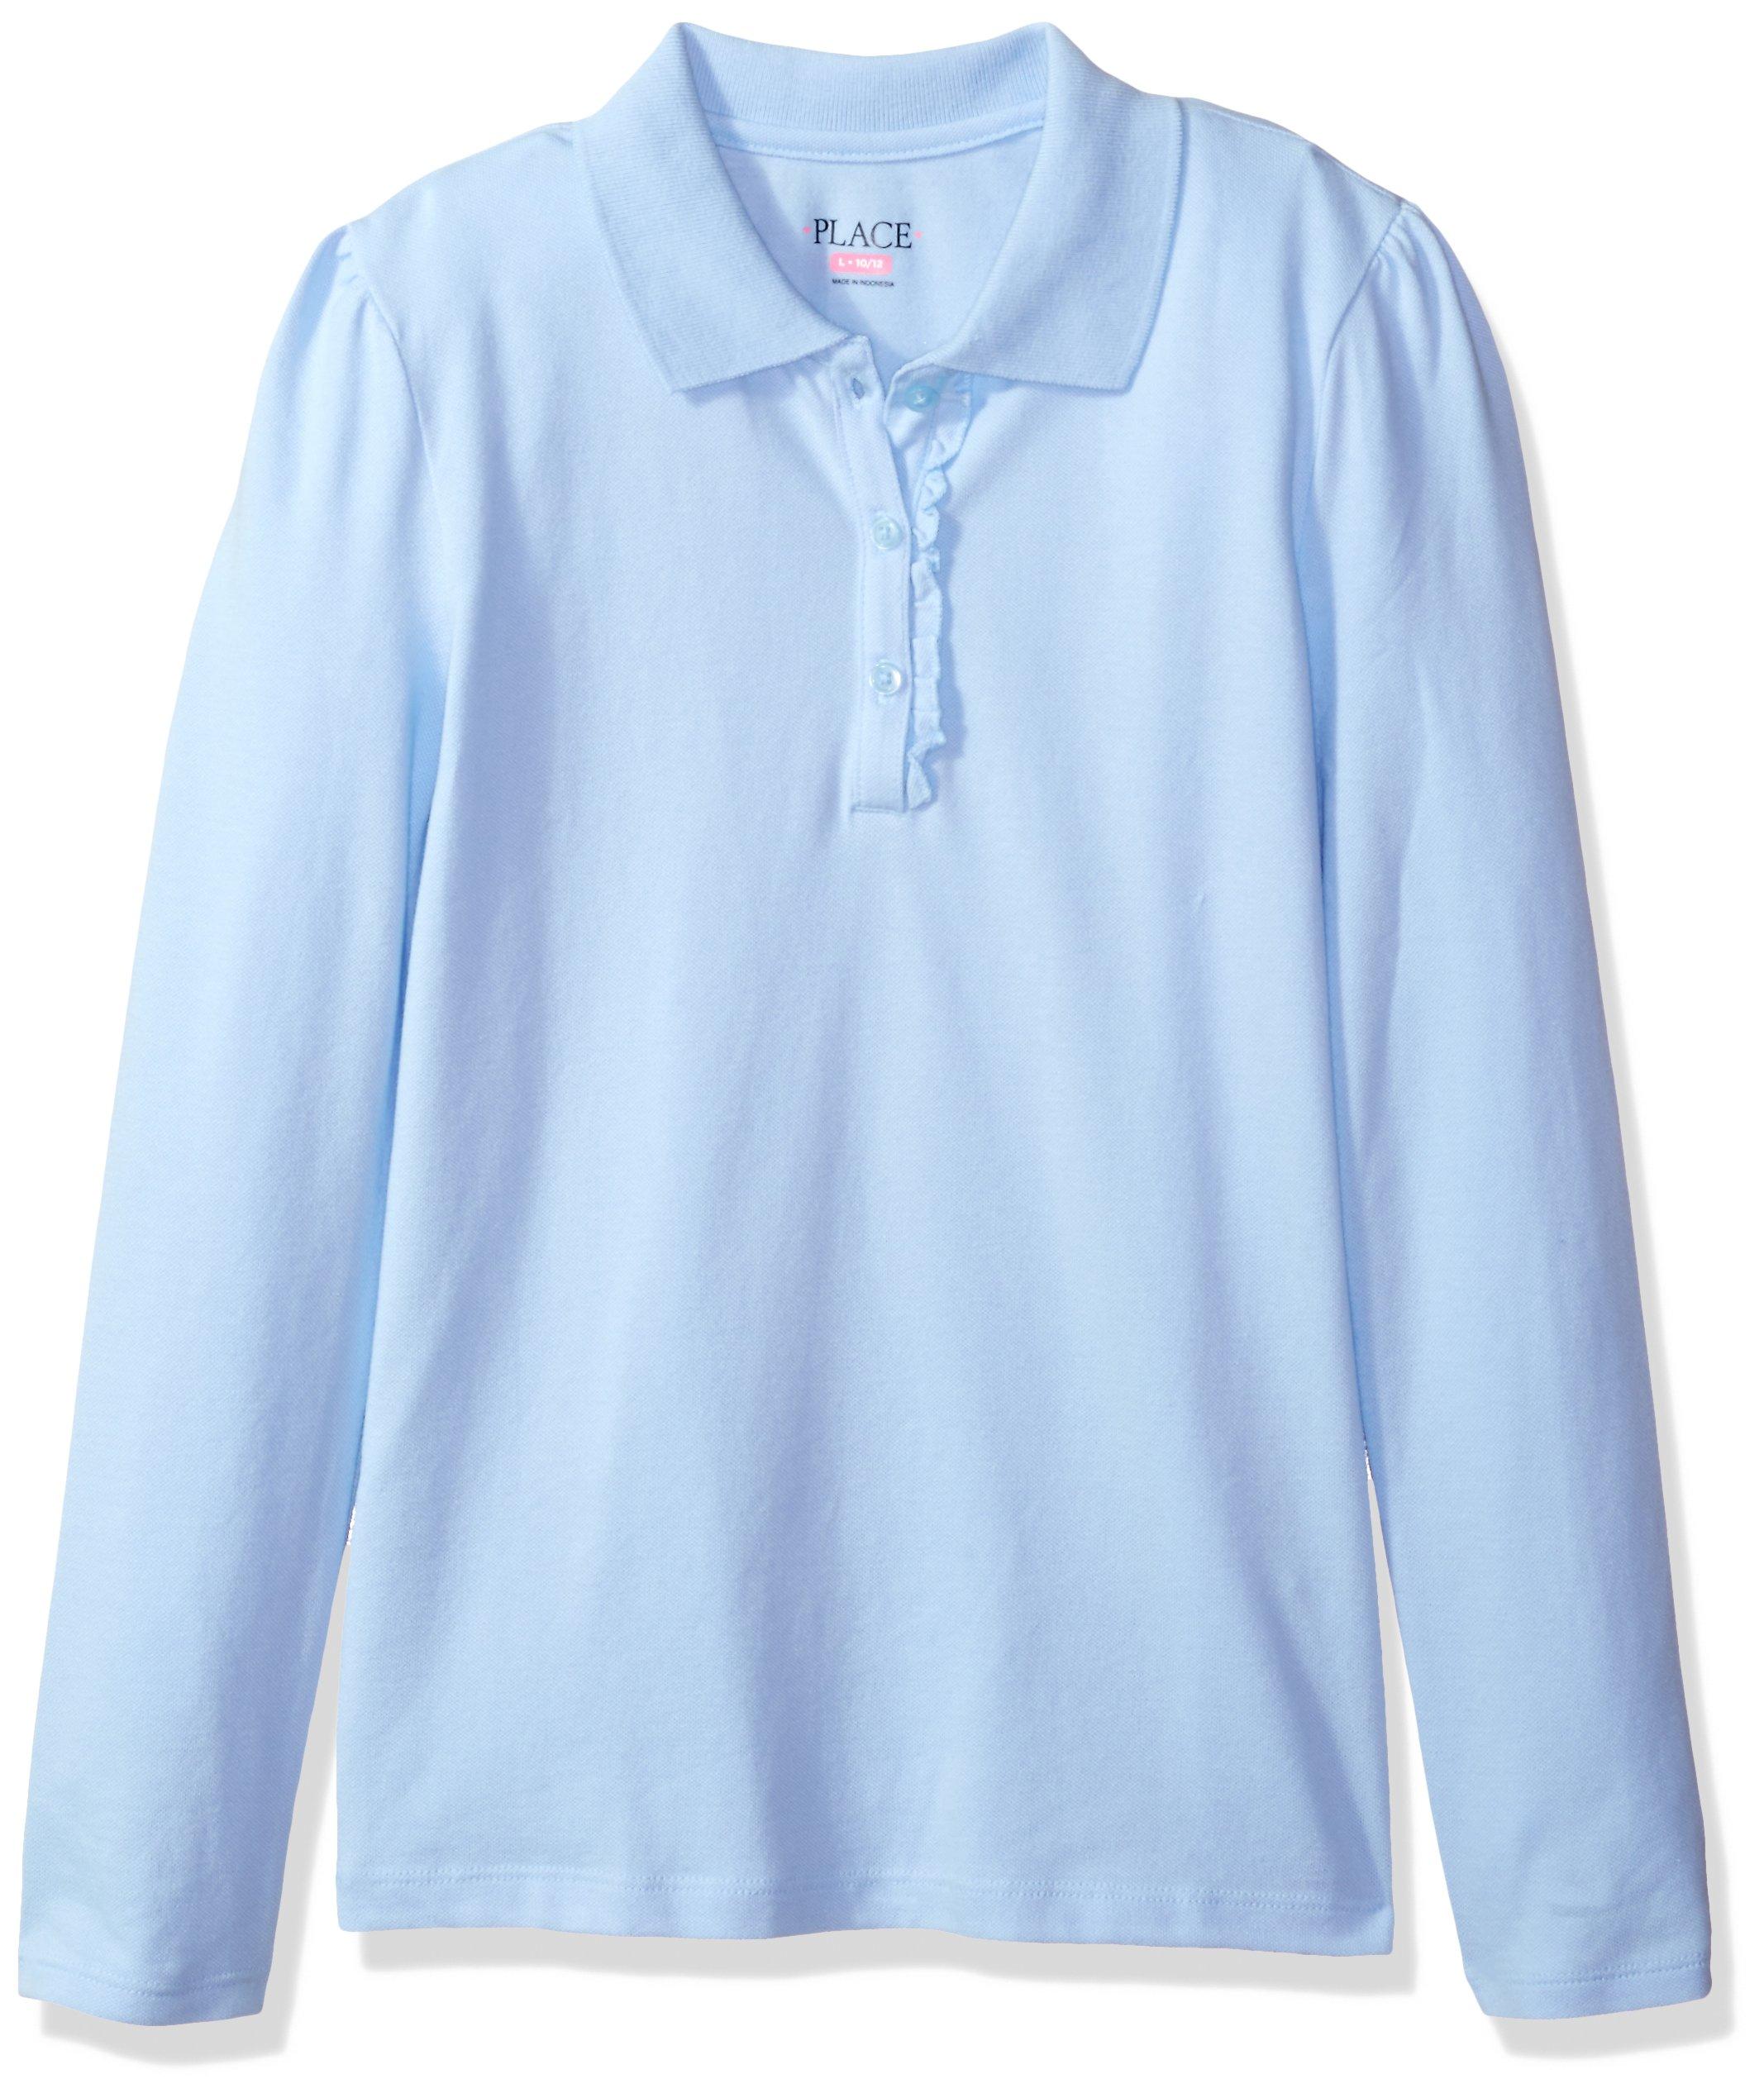 The Children's Place Big Girls' Uniform Long Sleeve Polo, Day Break-Ruffle 44389, Medium/7/8